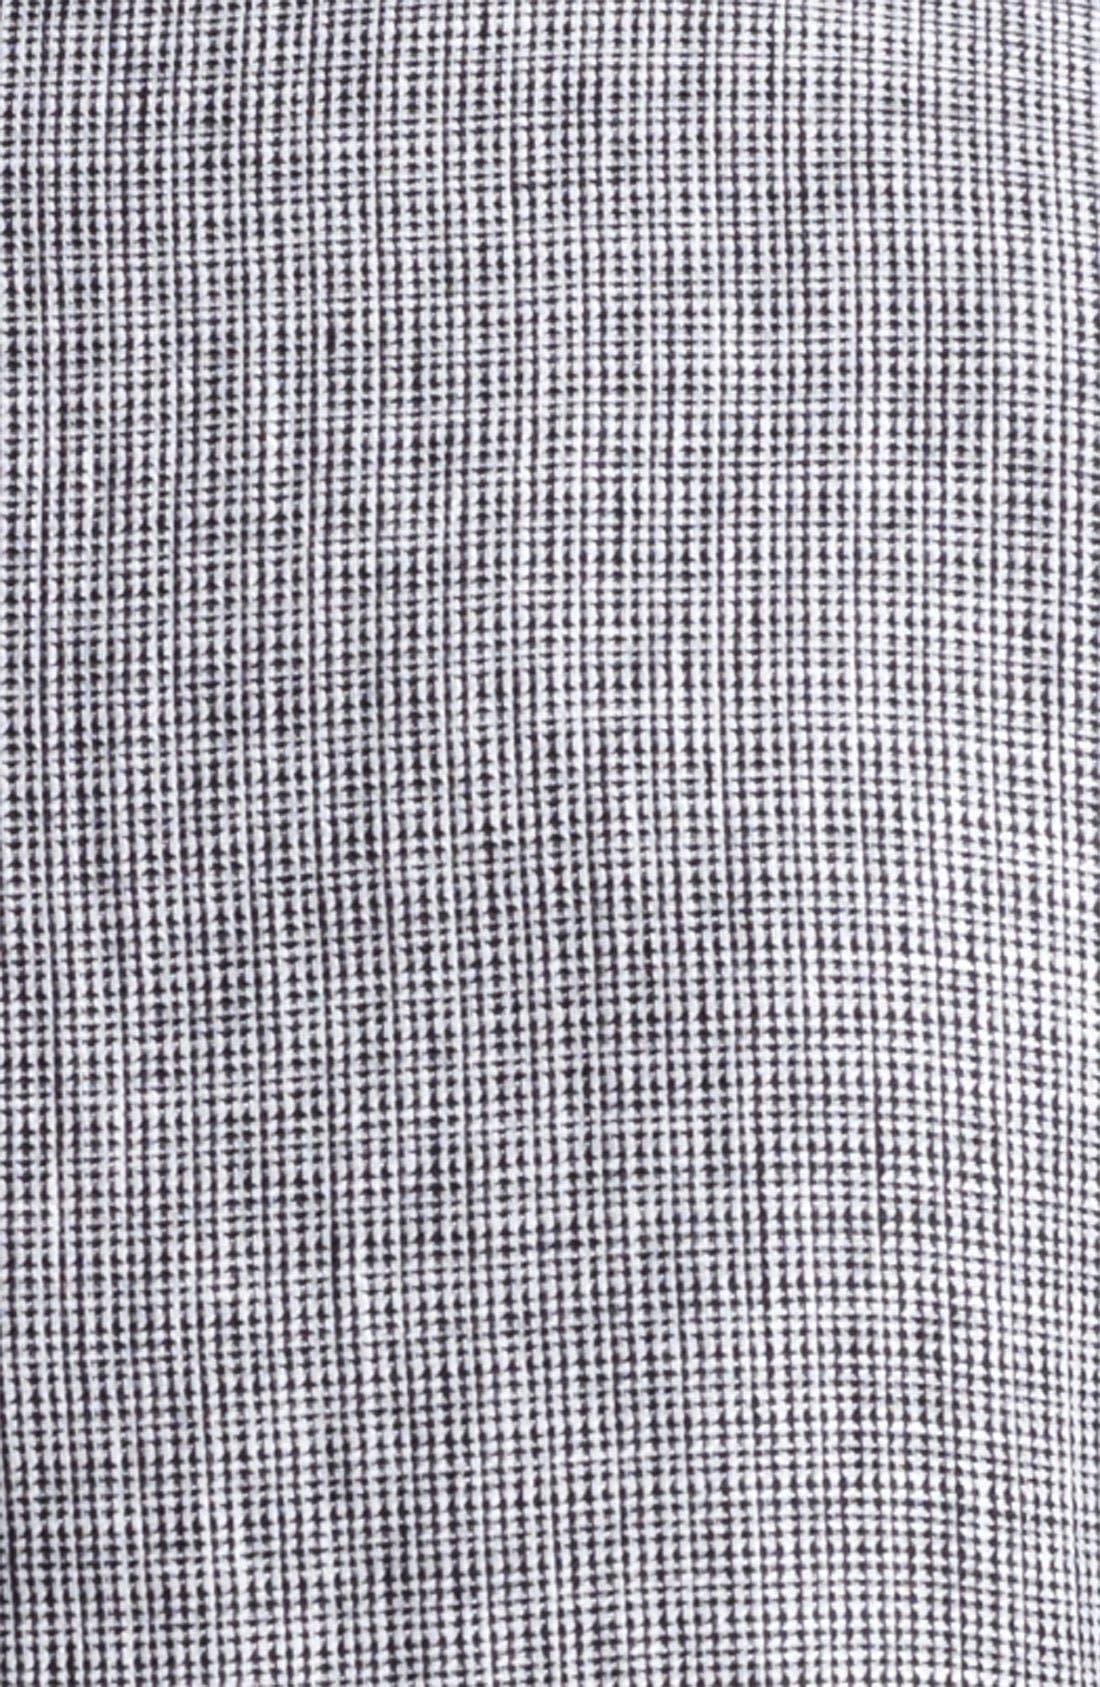 Alternate Image 3  - Z Zegna Trim Fit Linen Sportcoat